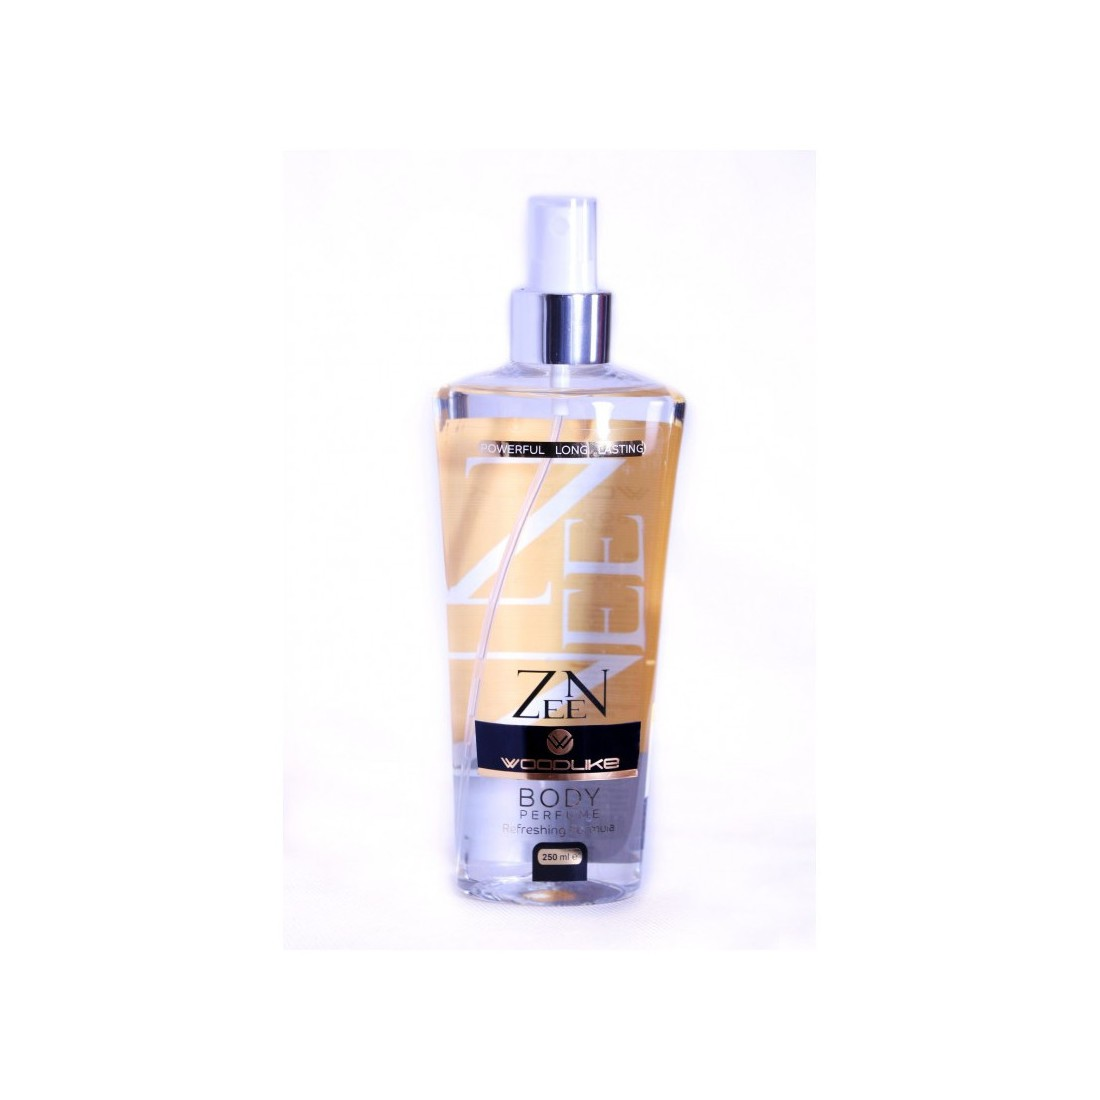 بادی اسپلش وودلایک مدل Zeen زیین 250 میلی لیتر - Woodlike Zeen Body Splash 250 ml